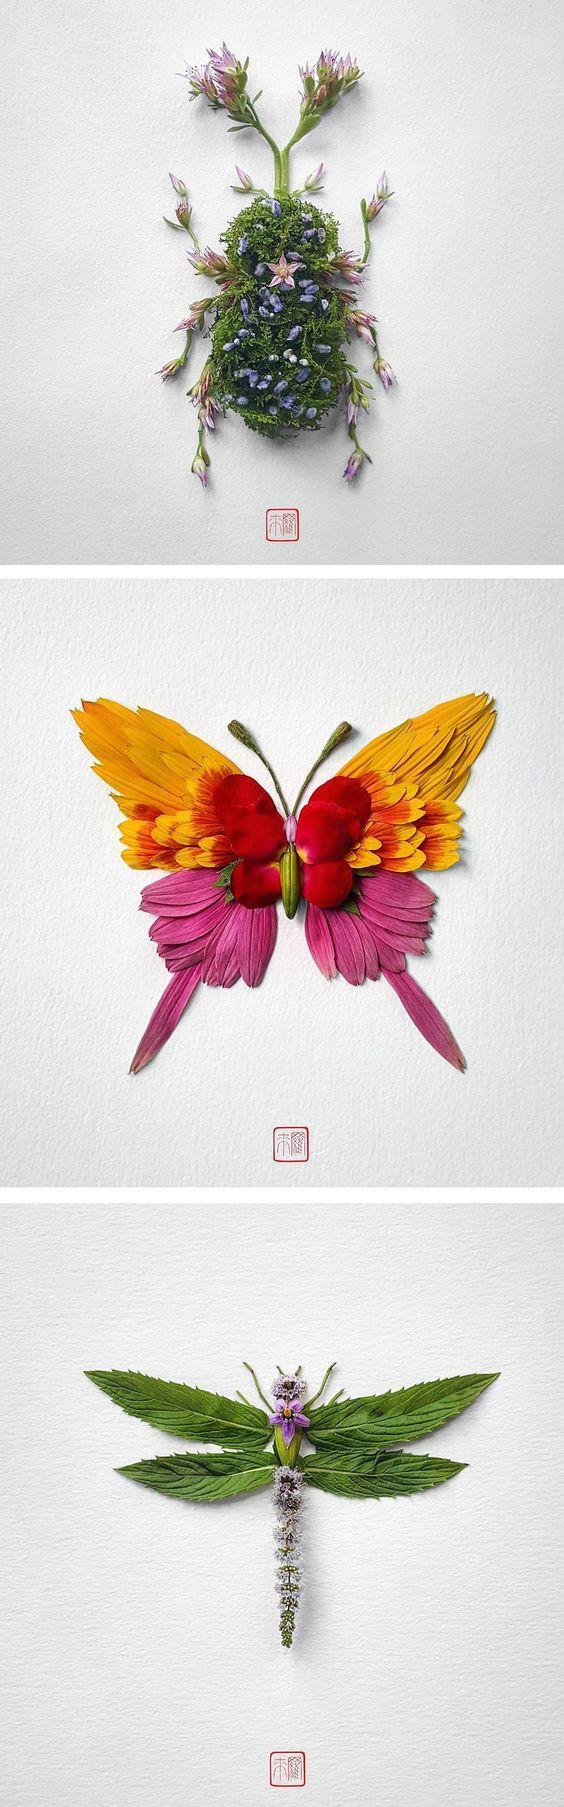 Insect Flower Arrangements by Raku Inoue